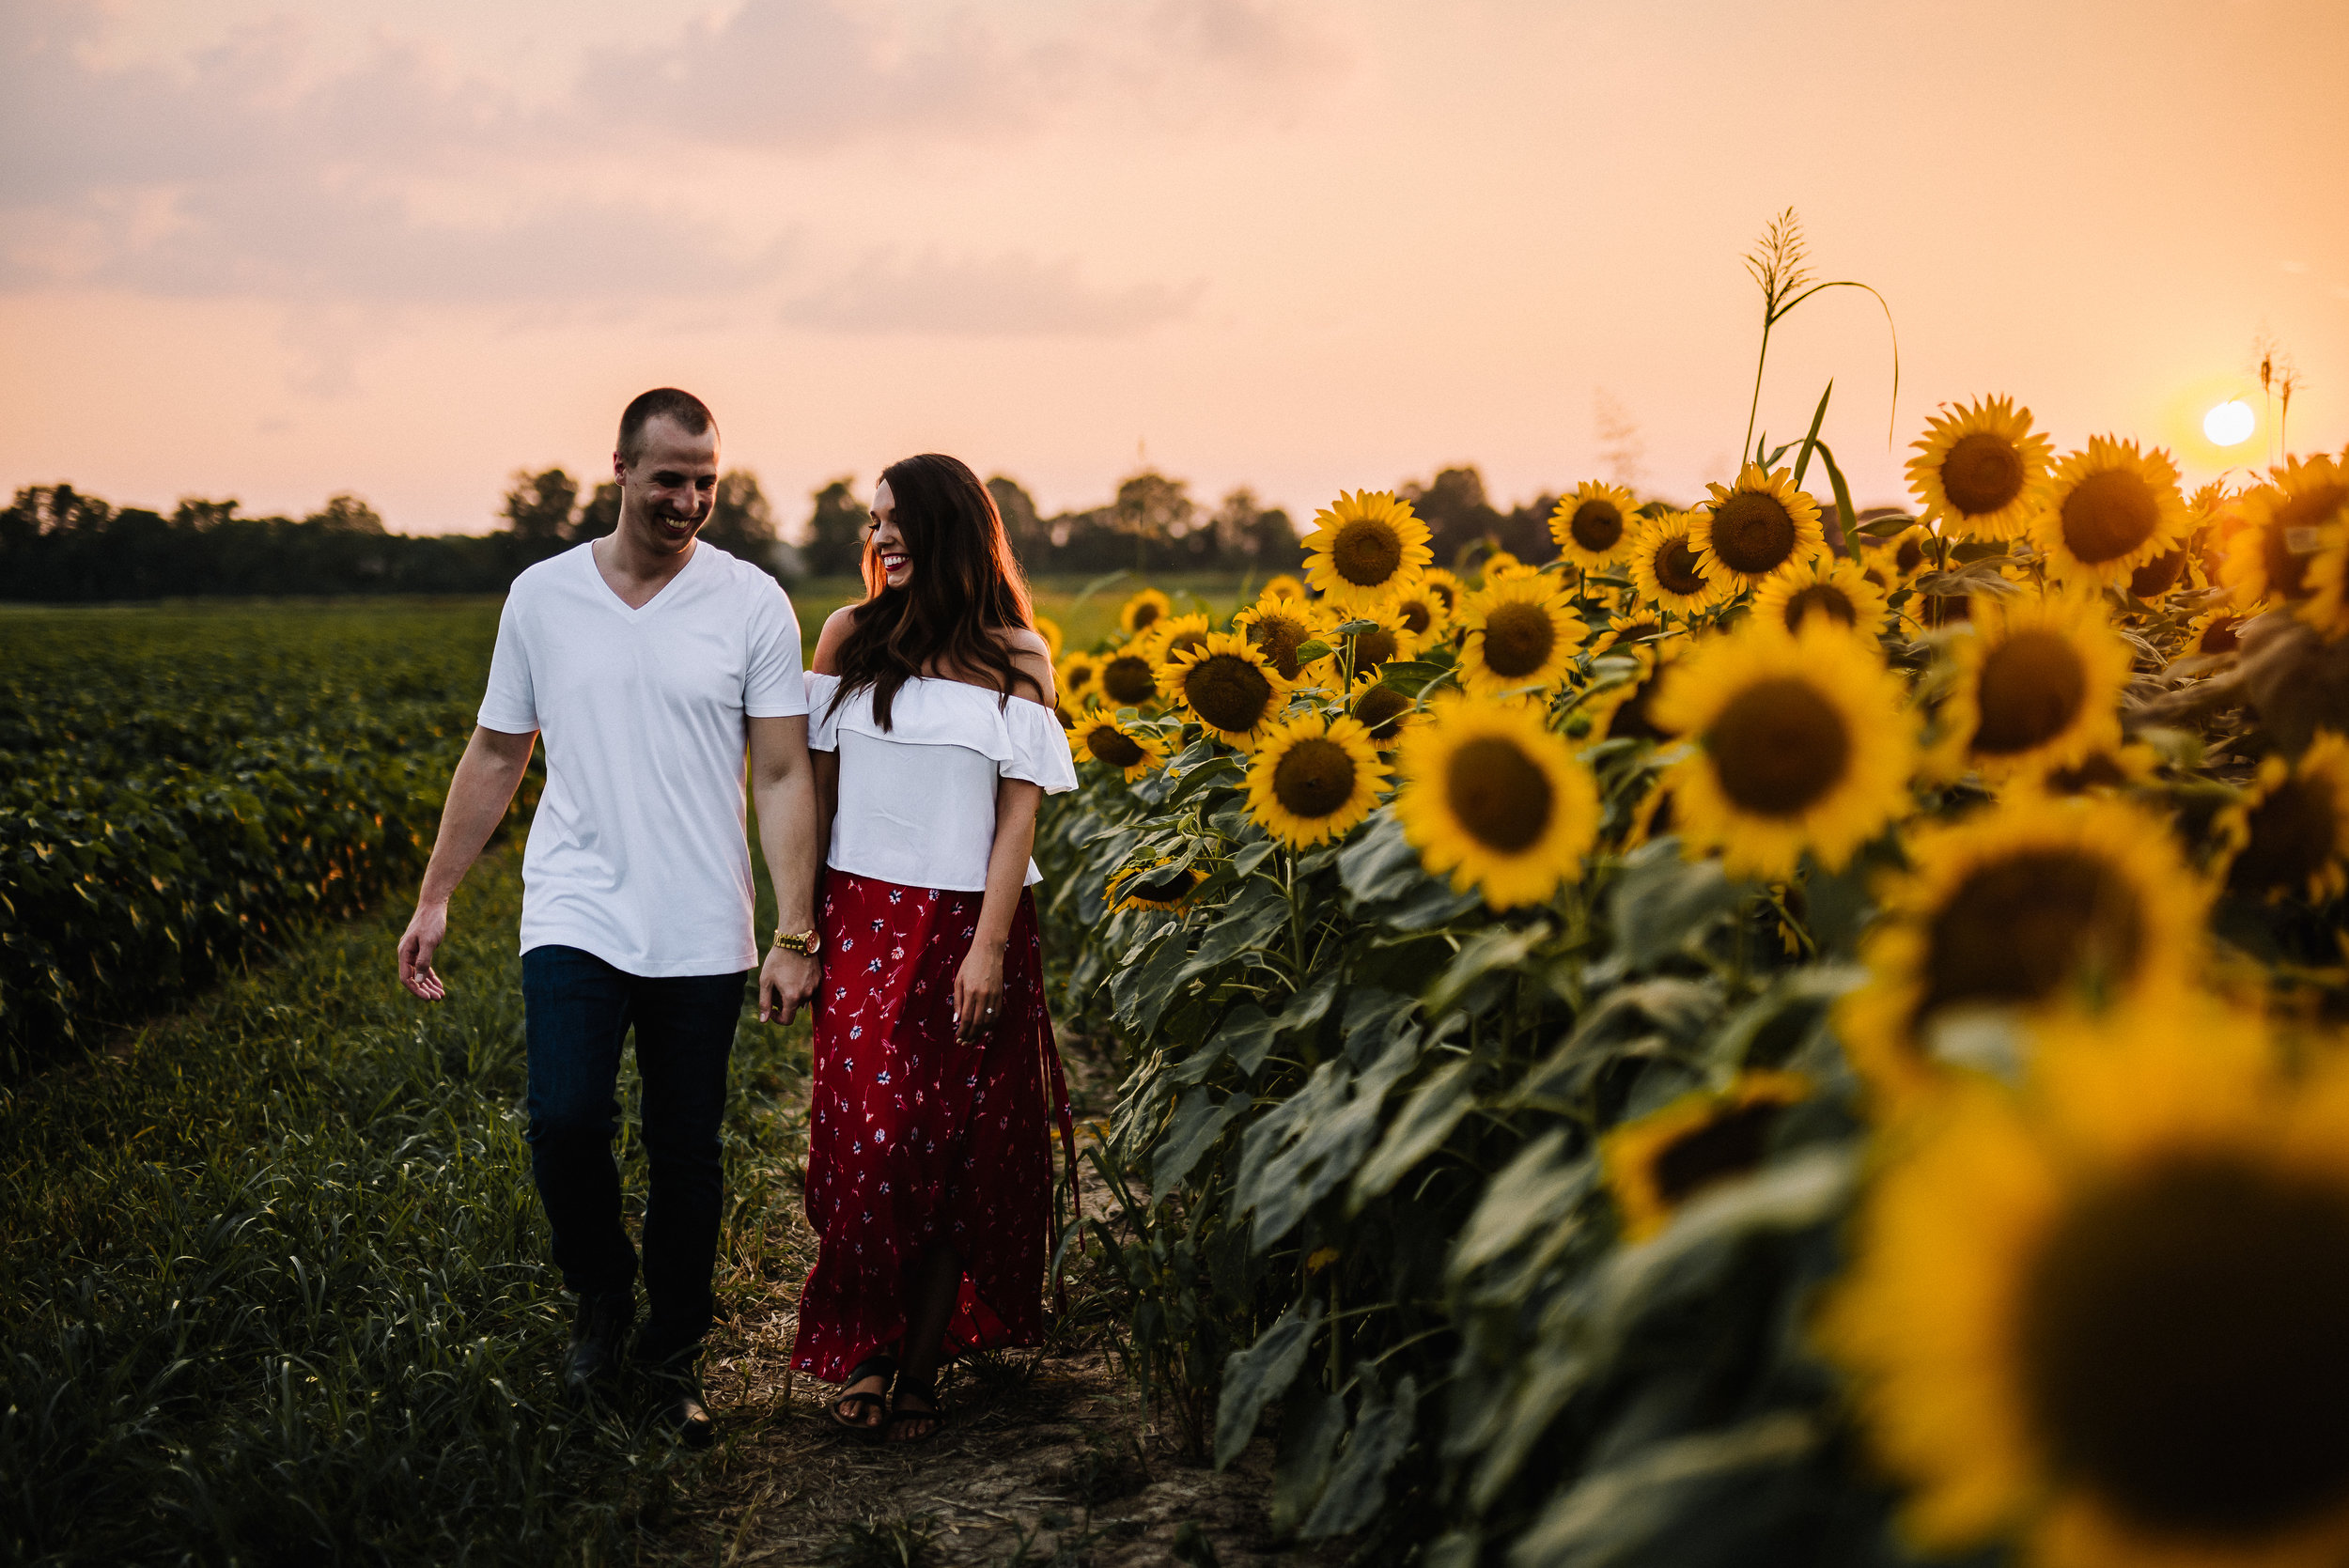 Kaitlynne&Van_Sunflowers_Ashley-Benham-Photography-43.jpg